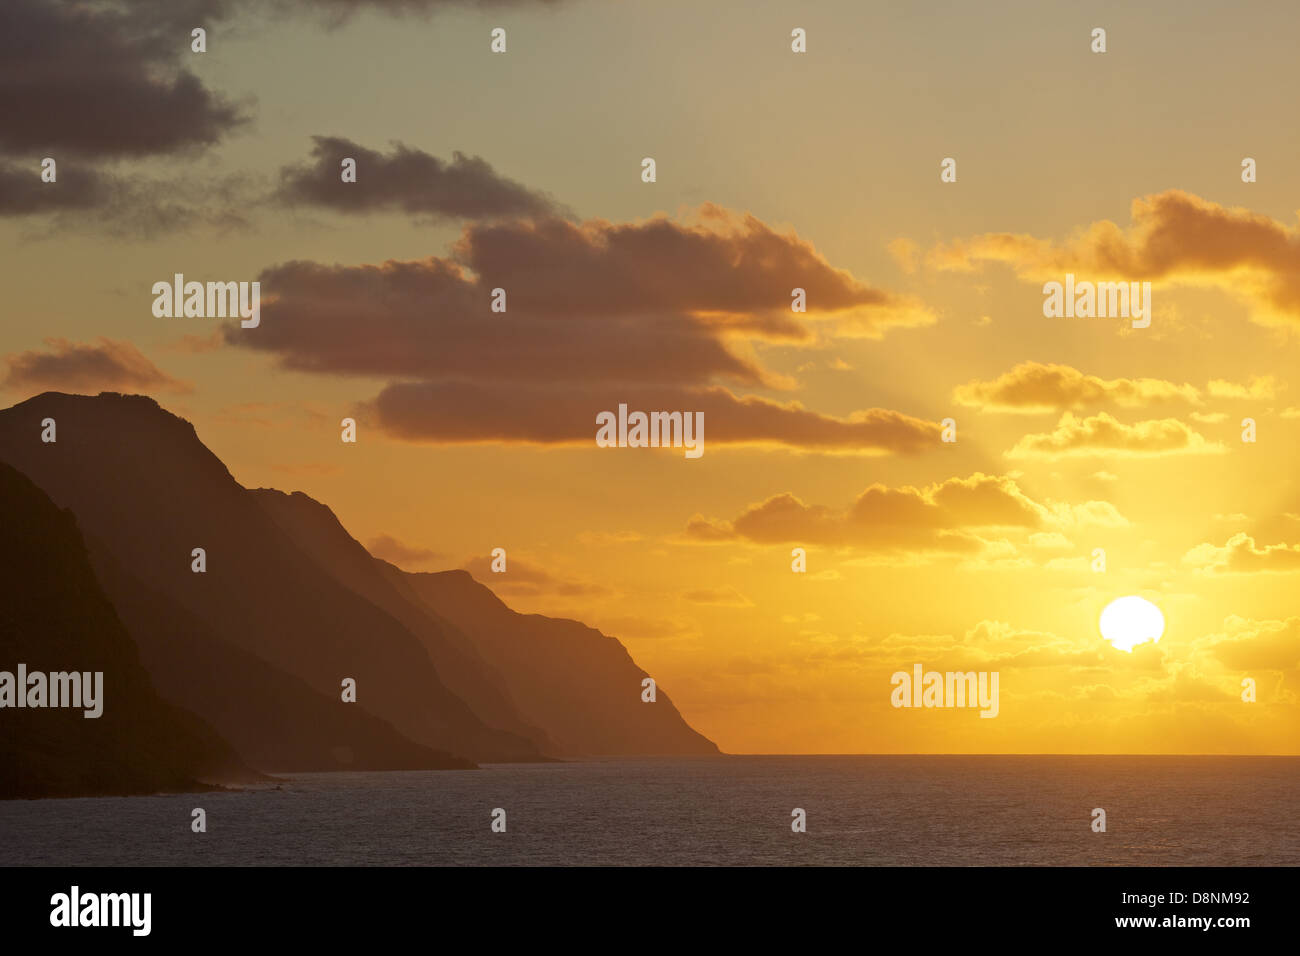 Sunset at north coast of São Jorge island - Azores Stock Photo